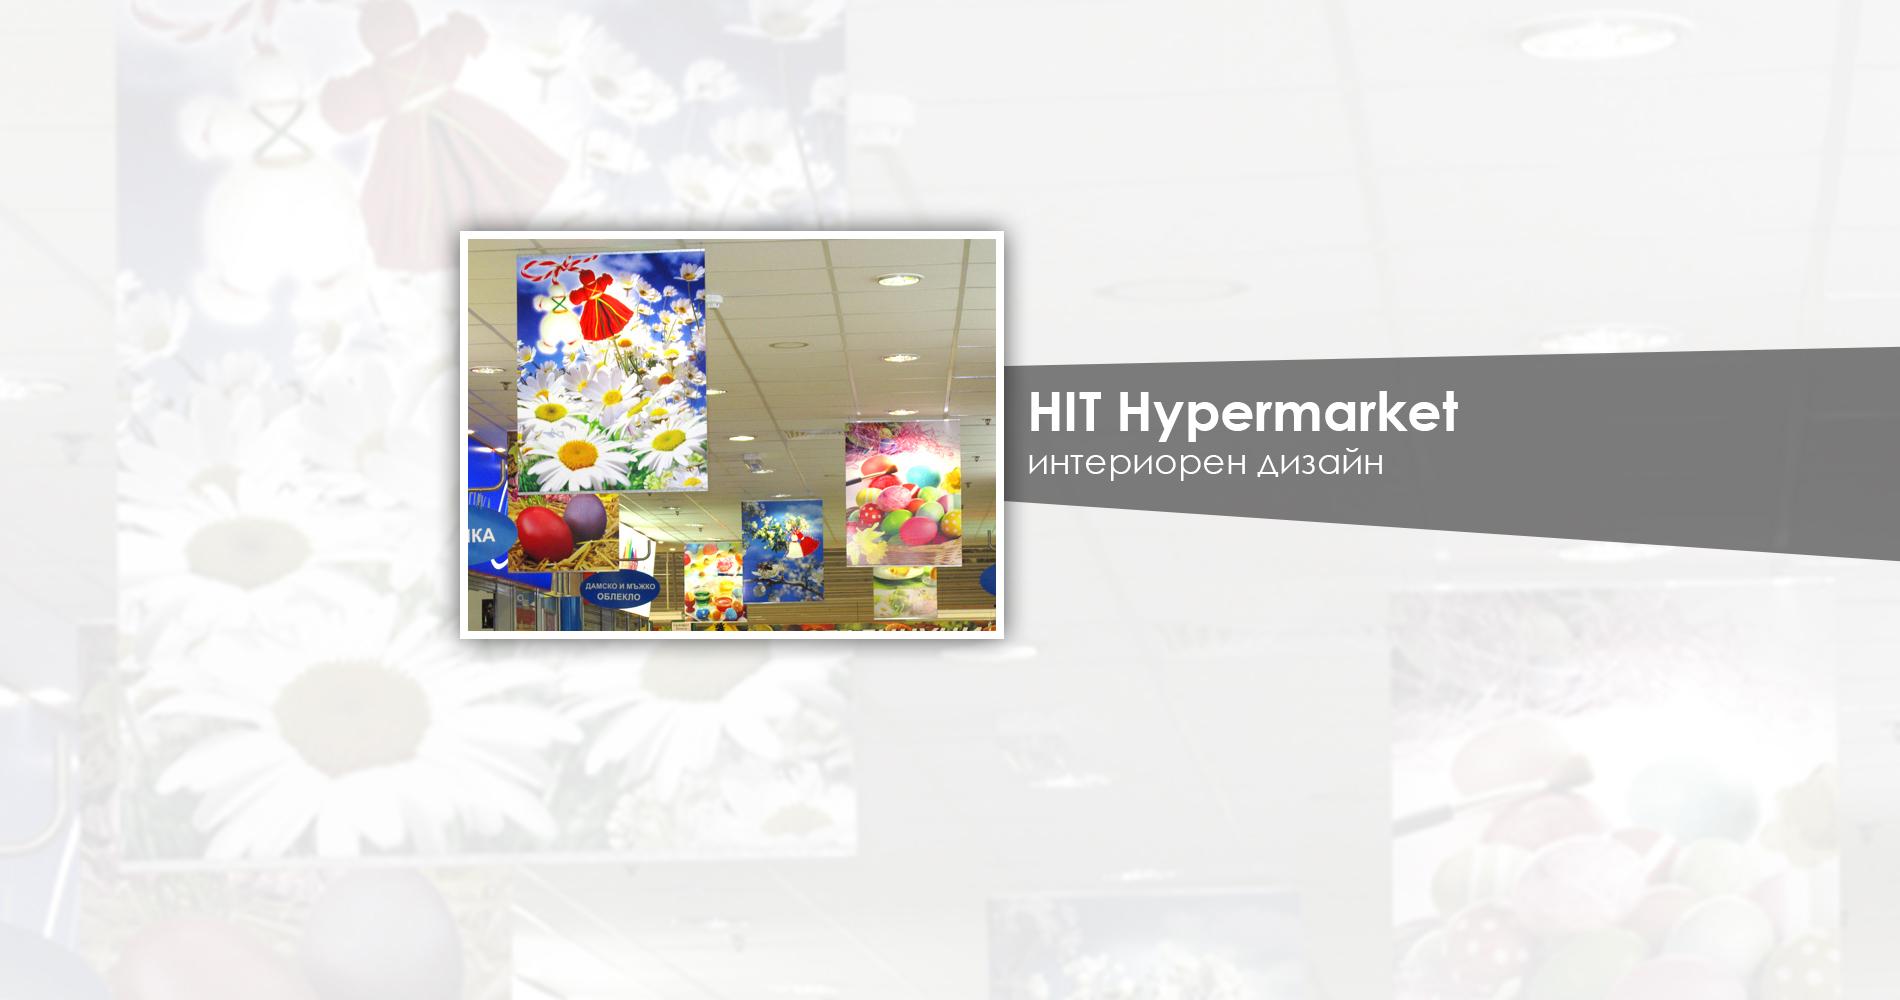 hithypermarket5